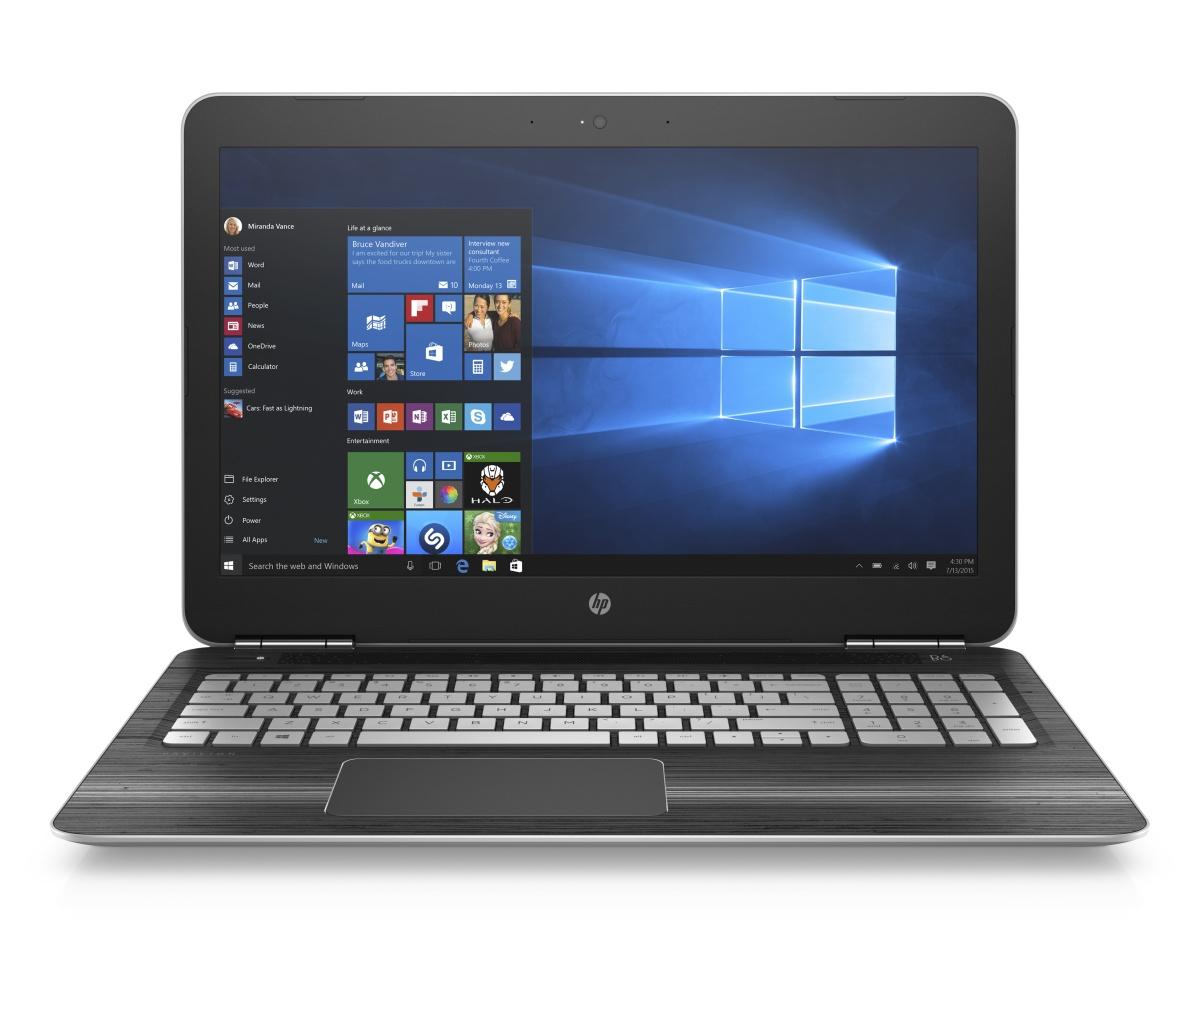 "HP Pavilion gaming 15-bc200nc/Intel i5-7300HQ/8GB/128 GB SSD M.2 + 1TB/DVDRW/ GTX 1050 4GB/15,6"" FHD/Win 10/stříbrná"